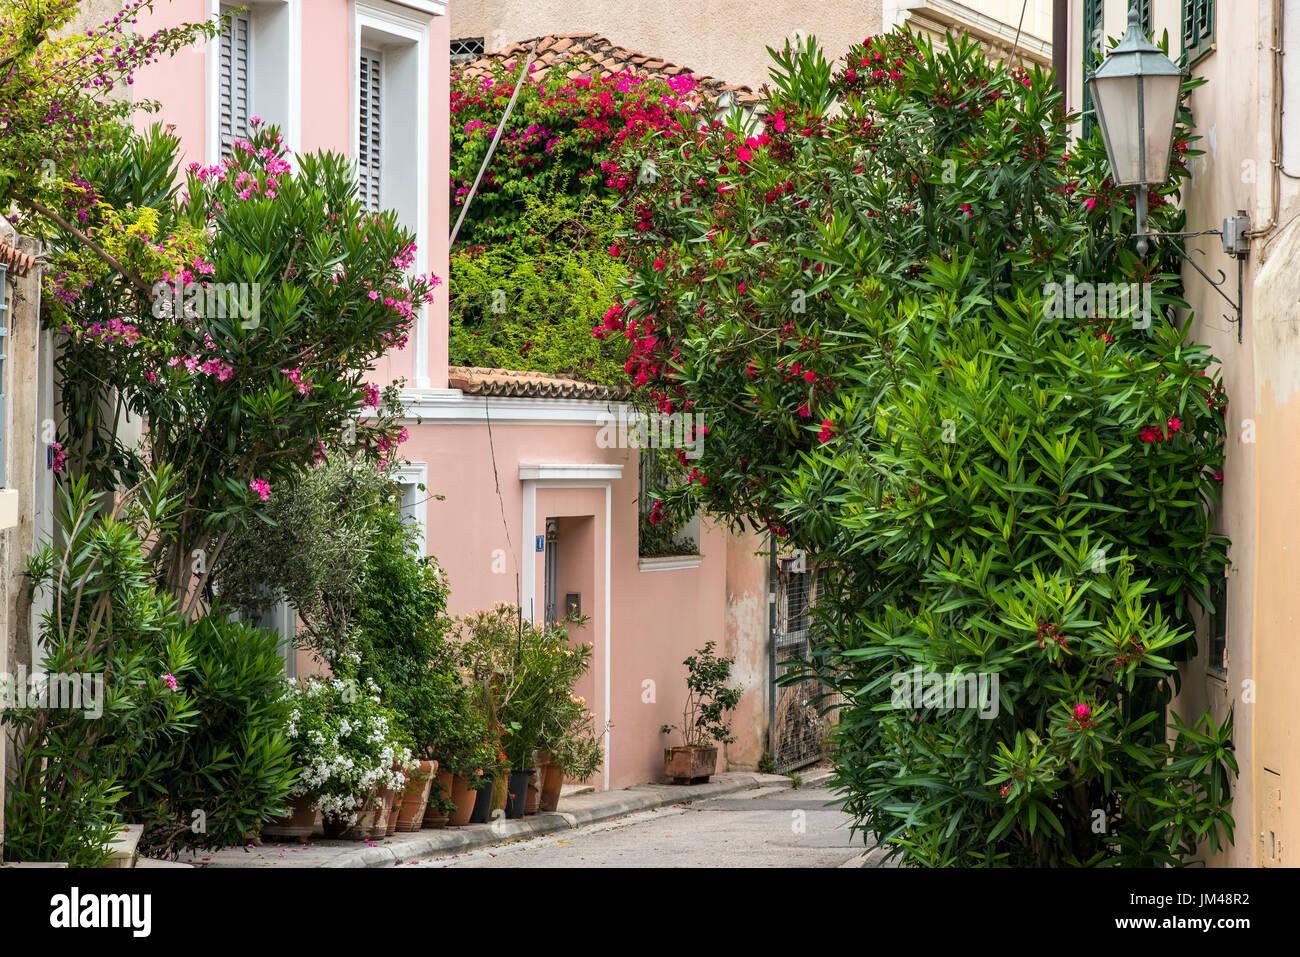 Typique du quartier d'Anafiotika, Athènes, Attique, Grèce Photo Stock